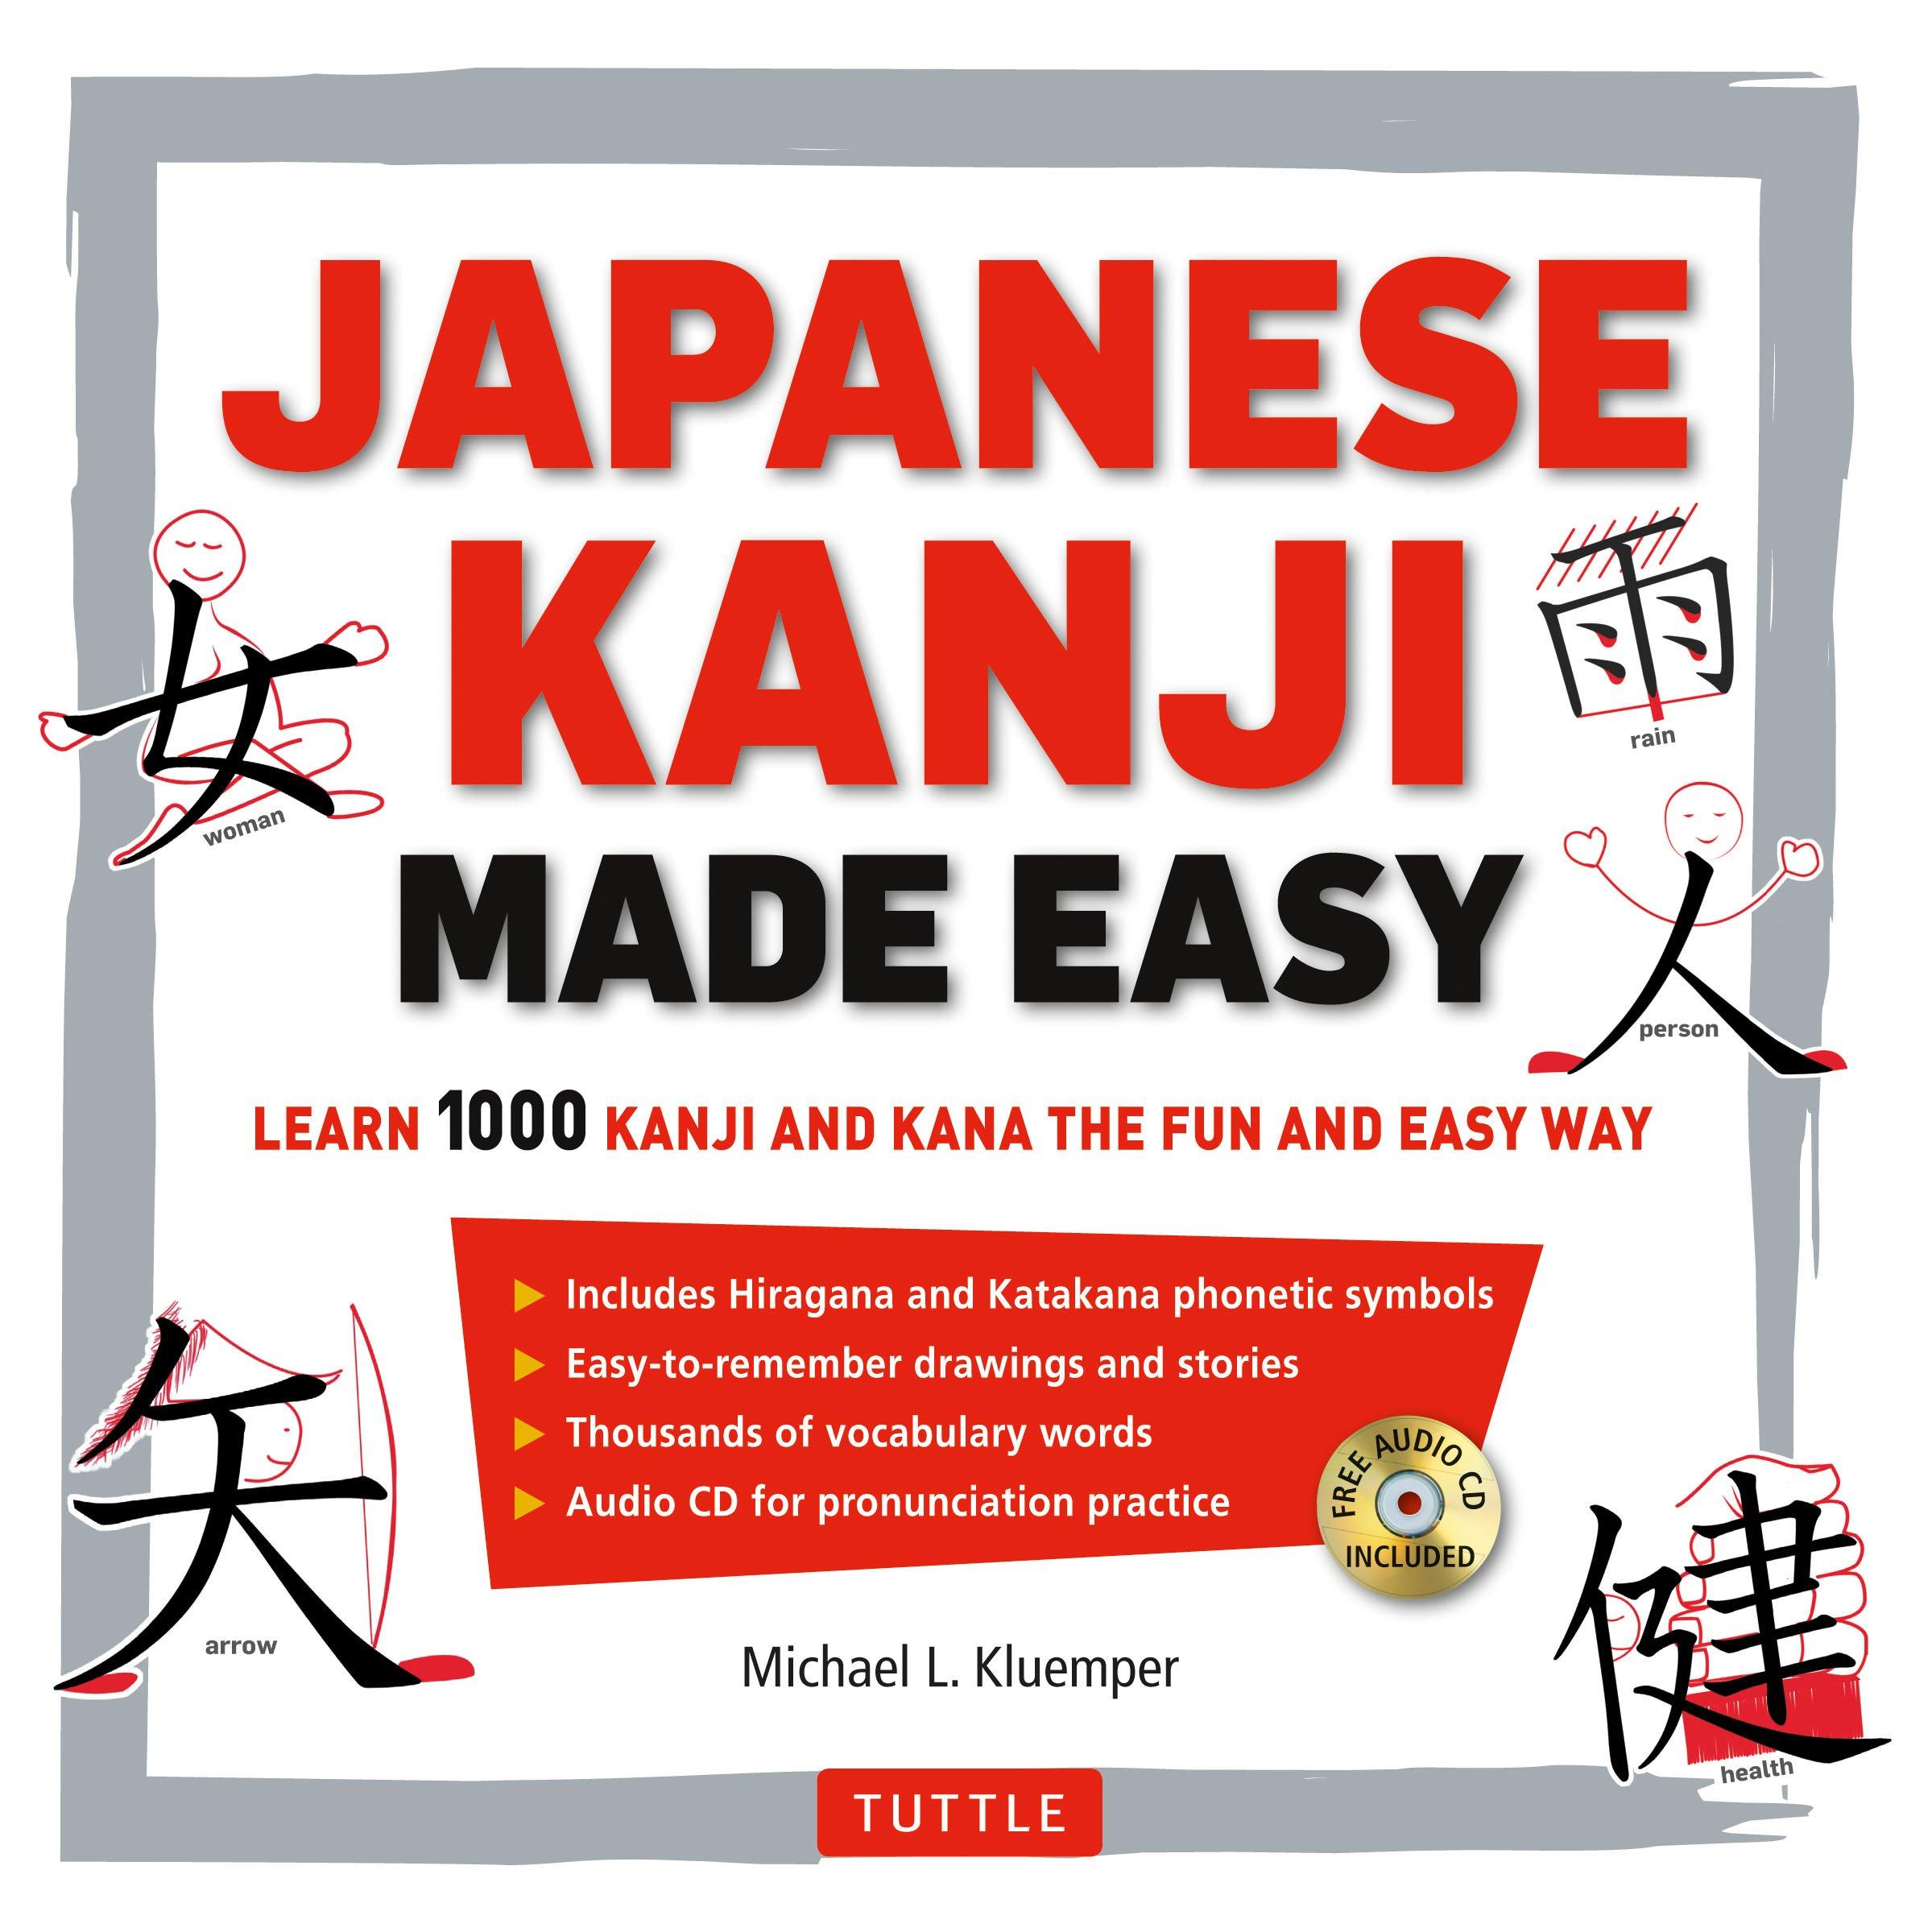 Japanese Kanji Made Easy Learn 1 000 Kanji And Kana The Fun And